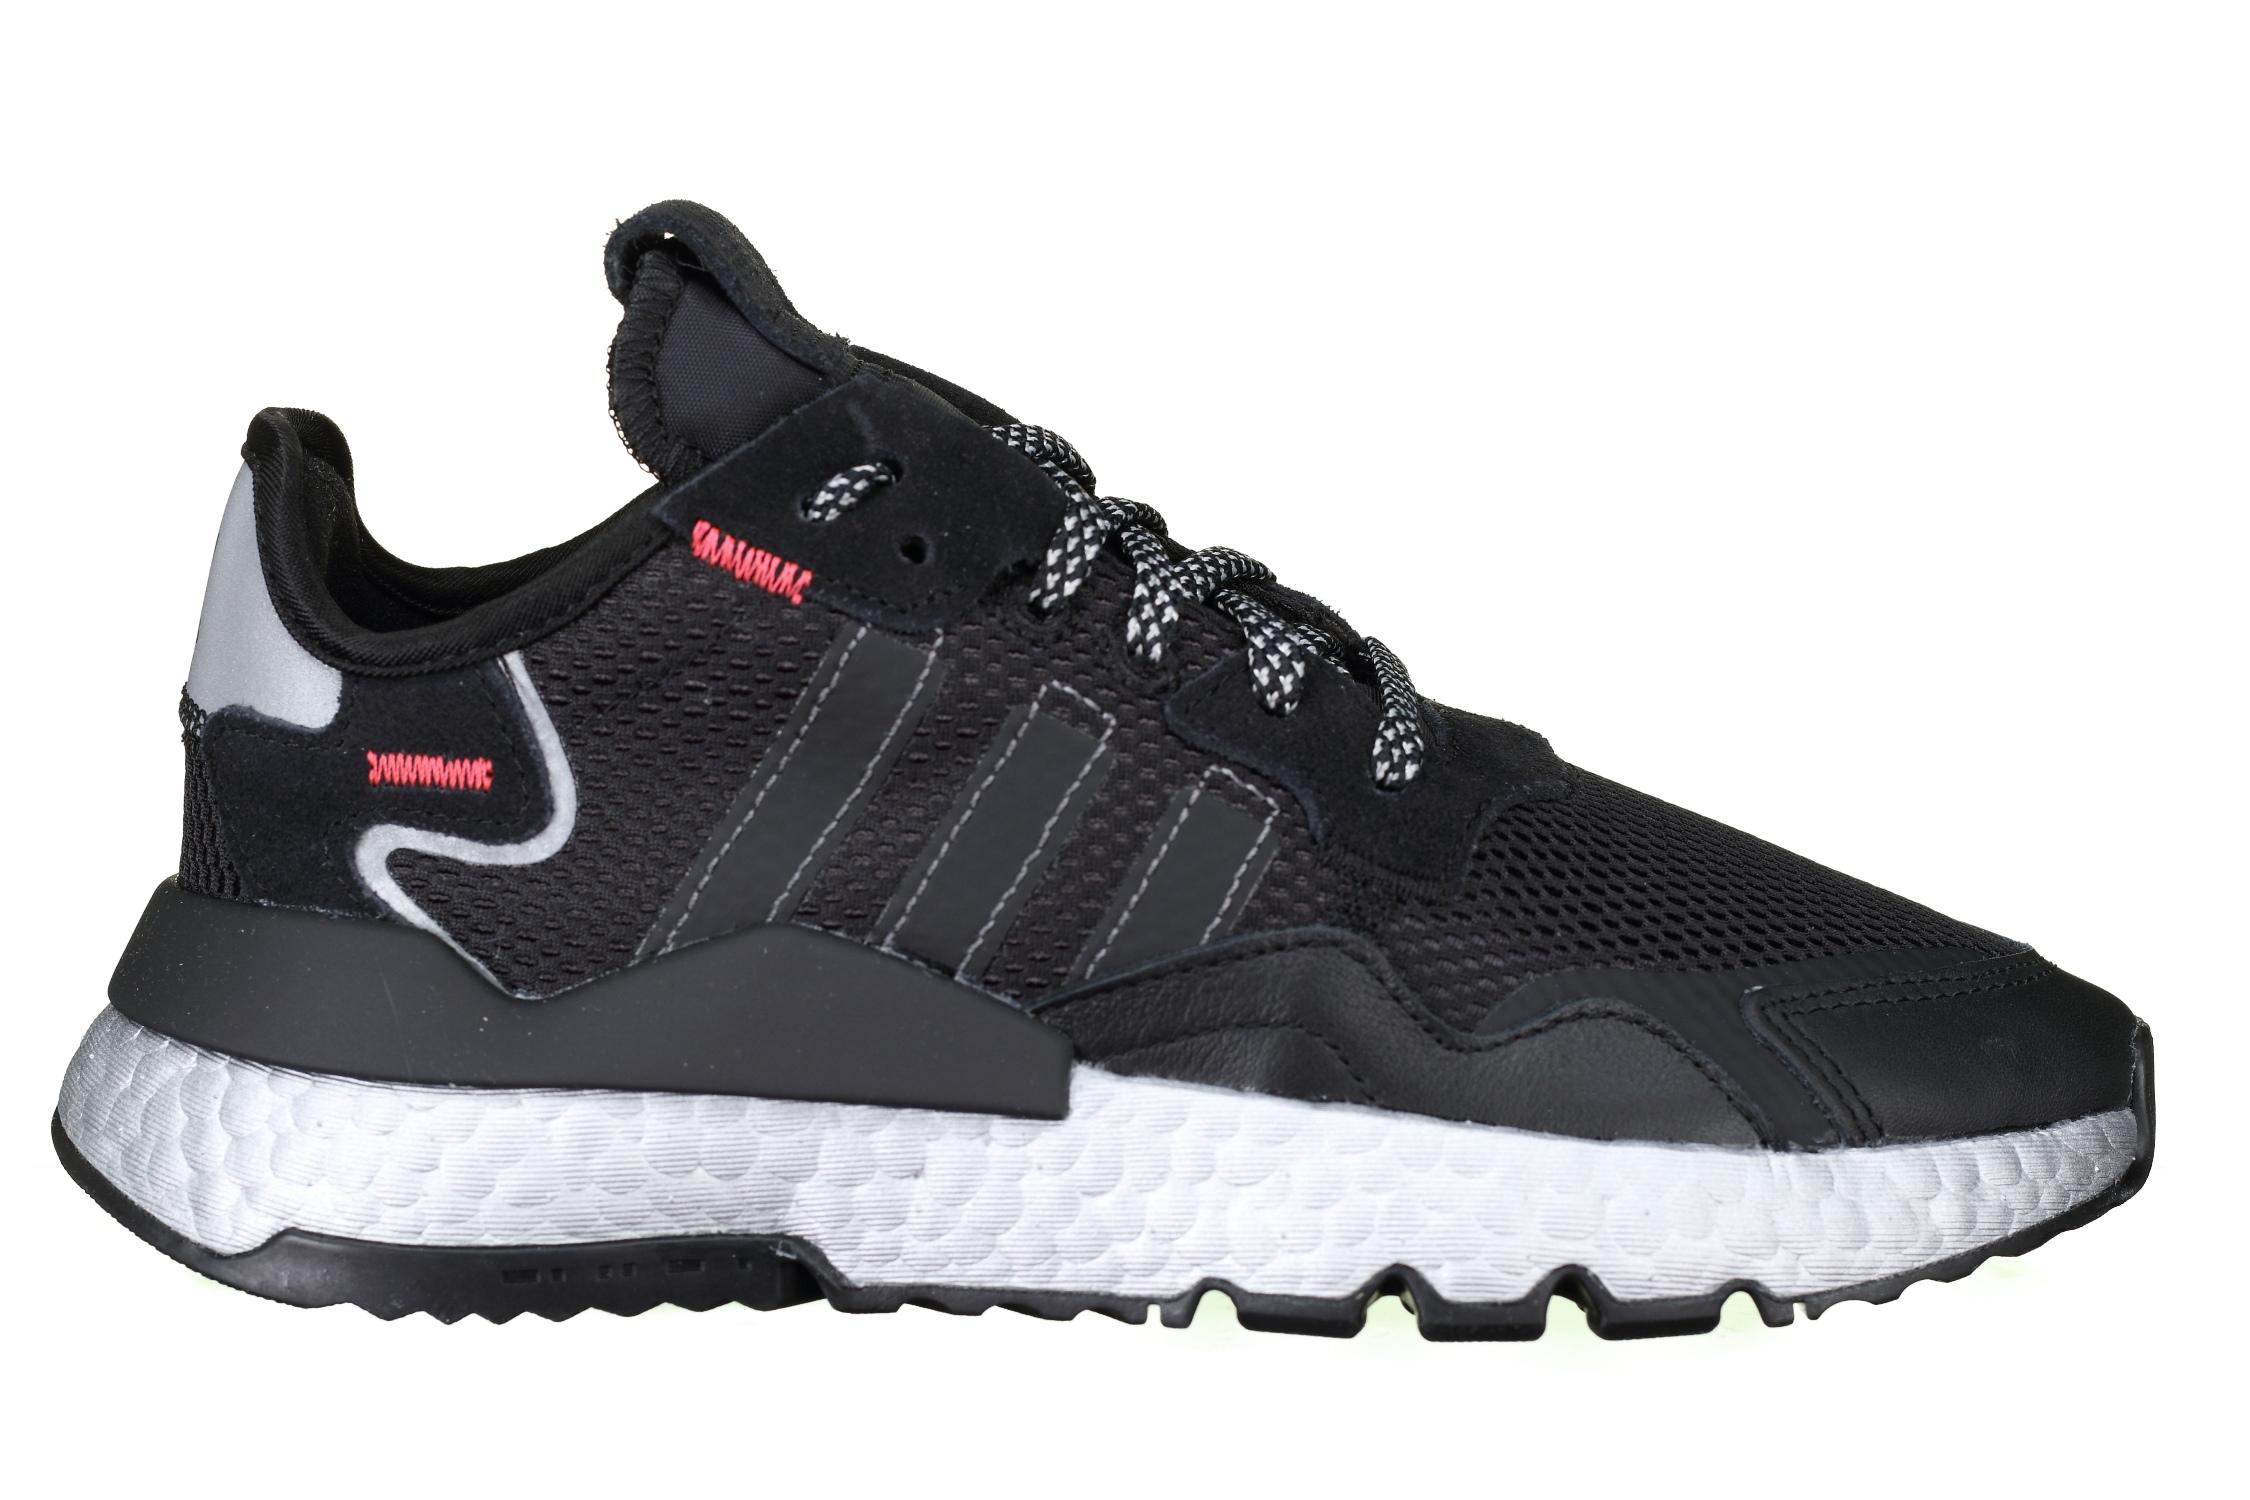 https://www.leadermode.com/187102/adidas-nite-jogger-w-fv4137-black.jpg